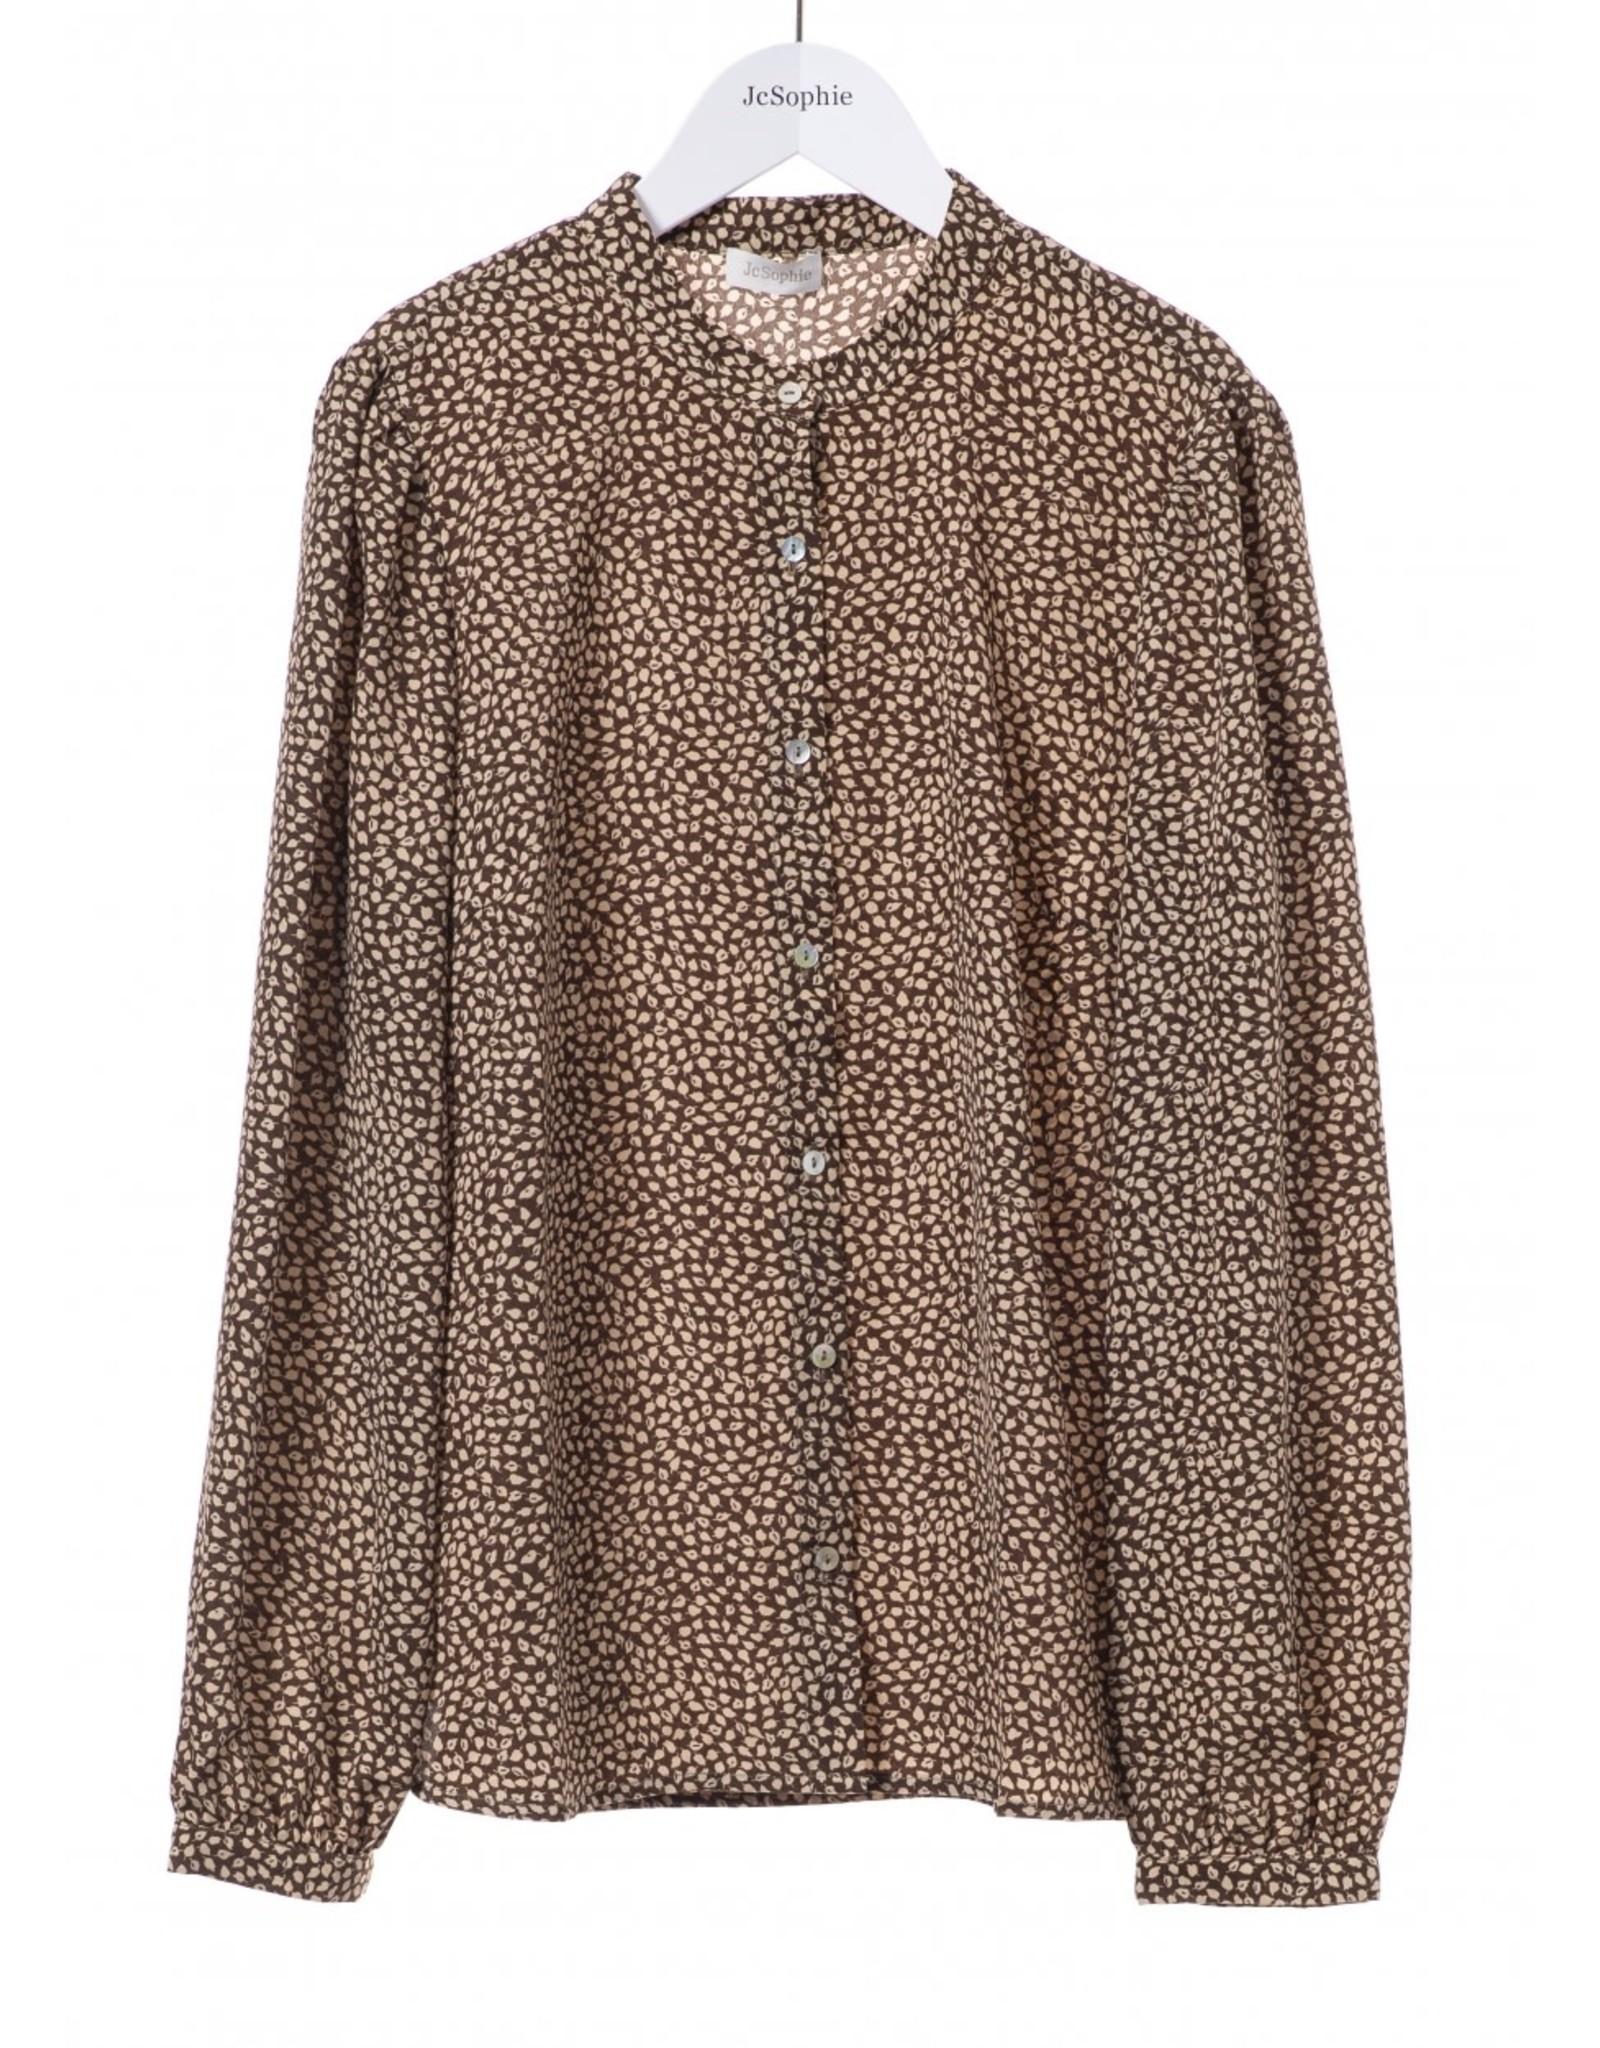 JcSophie JcSophie Enrico blouse E7064-366